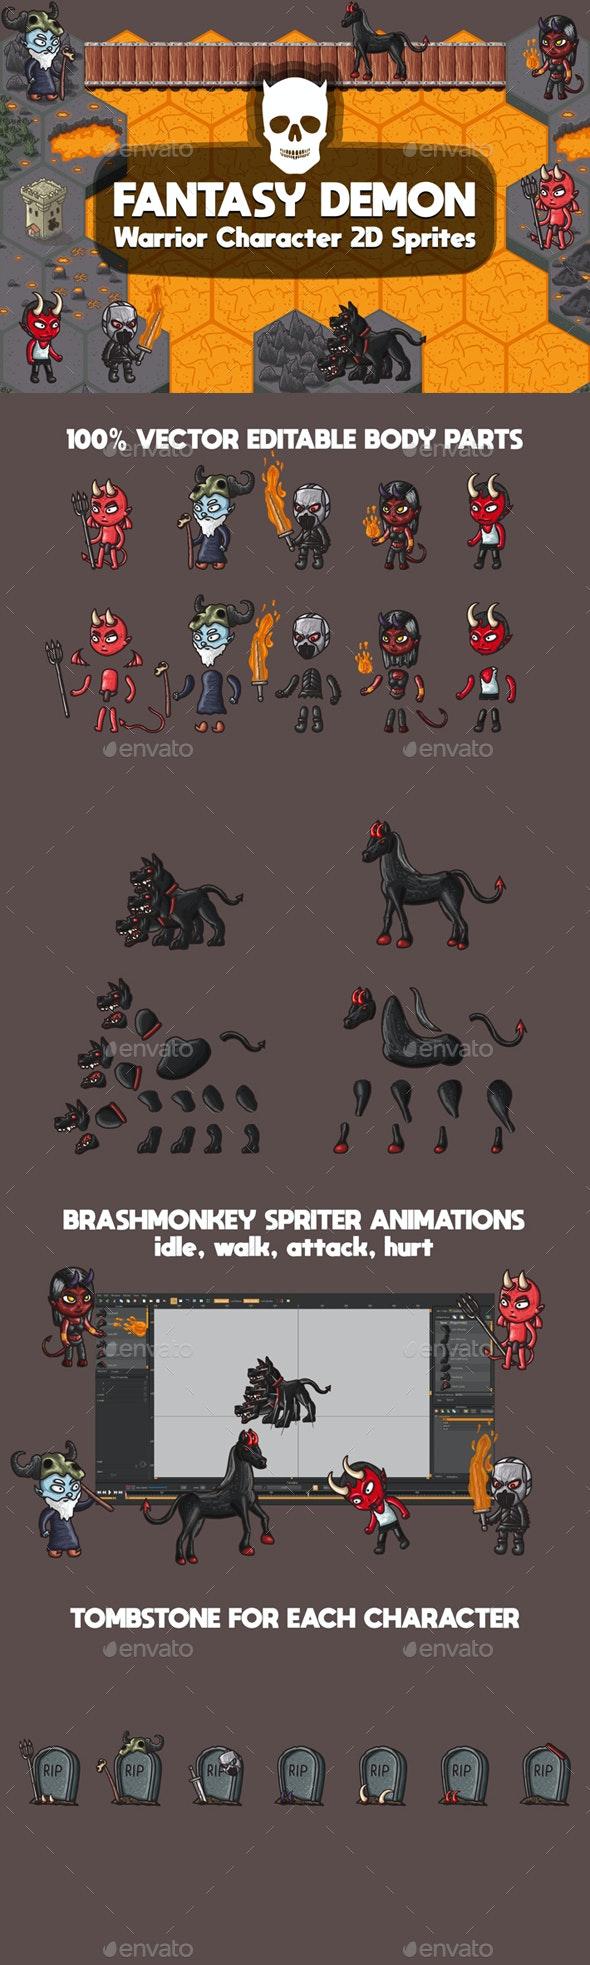 Demon Warrior Character Sprites - Sprites Game Assets